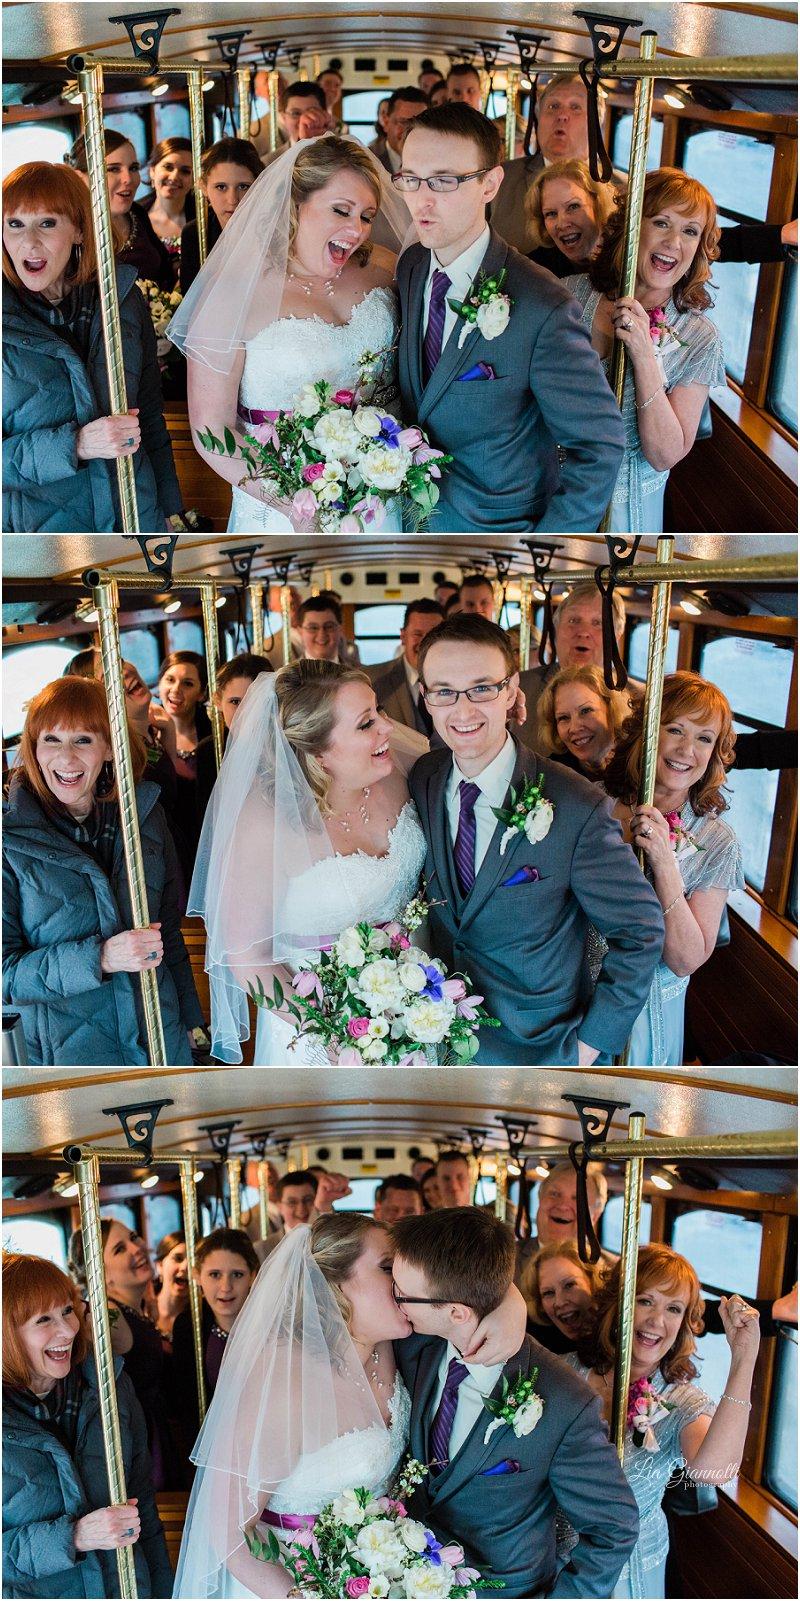 Lia Giannotti Photography Ann Arbor & Metro Detroit Wedding & Portrait Photographer, Dearborn Inn Wedding, Dearborn, MI_0071.jpg